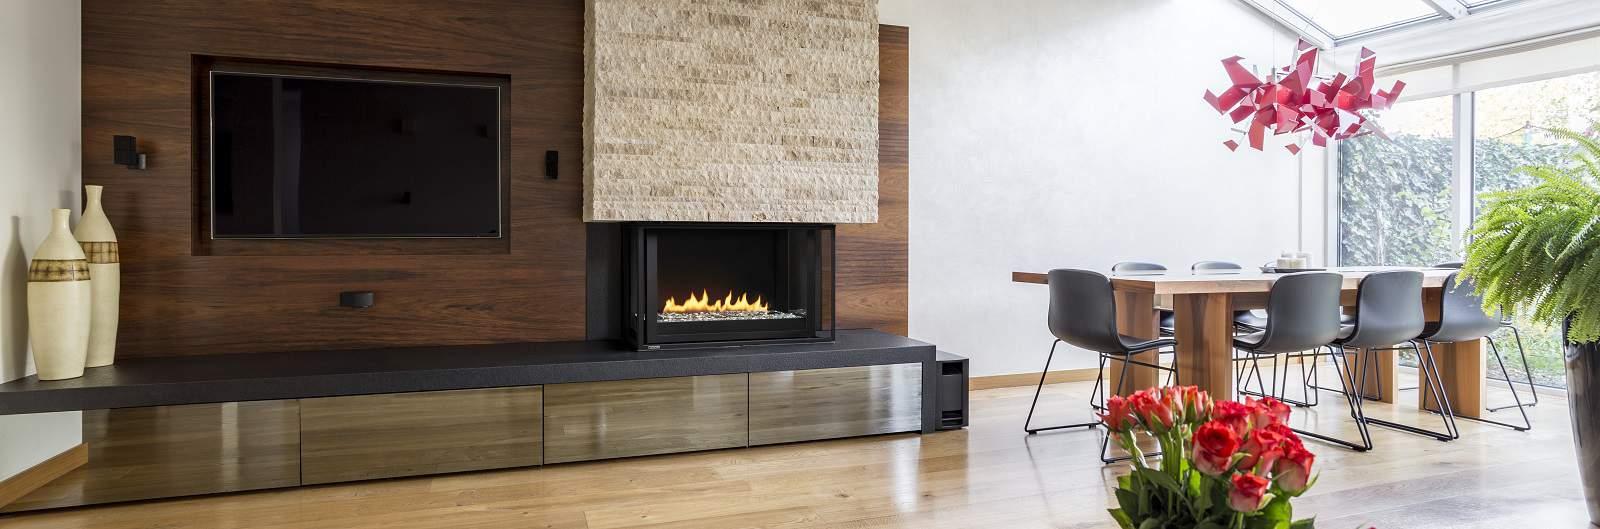 Montigo-Fireplaces-Impressive-Climate-Control-Ottawa